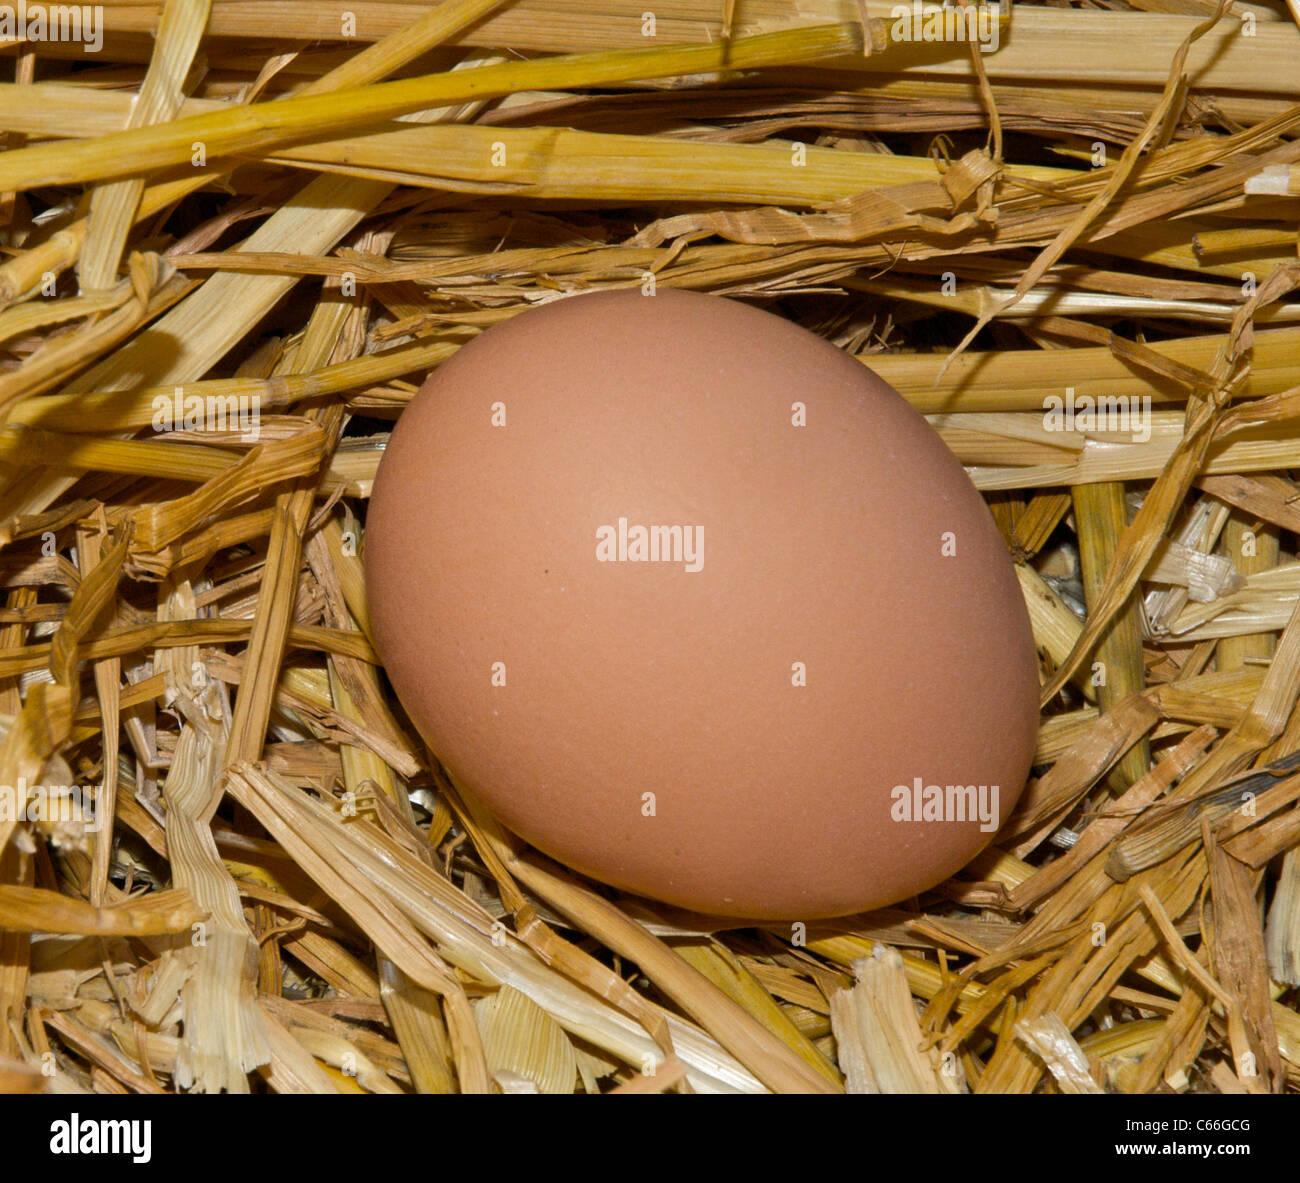 Newly laid hen's egg, fresh chicken's egg - Stock Image